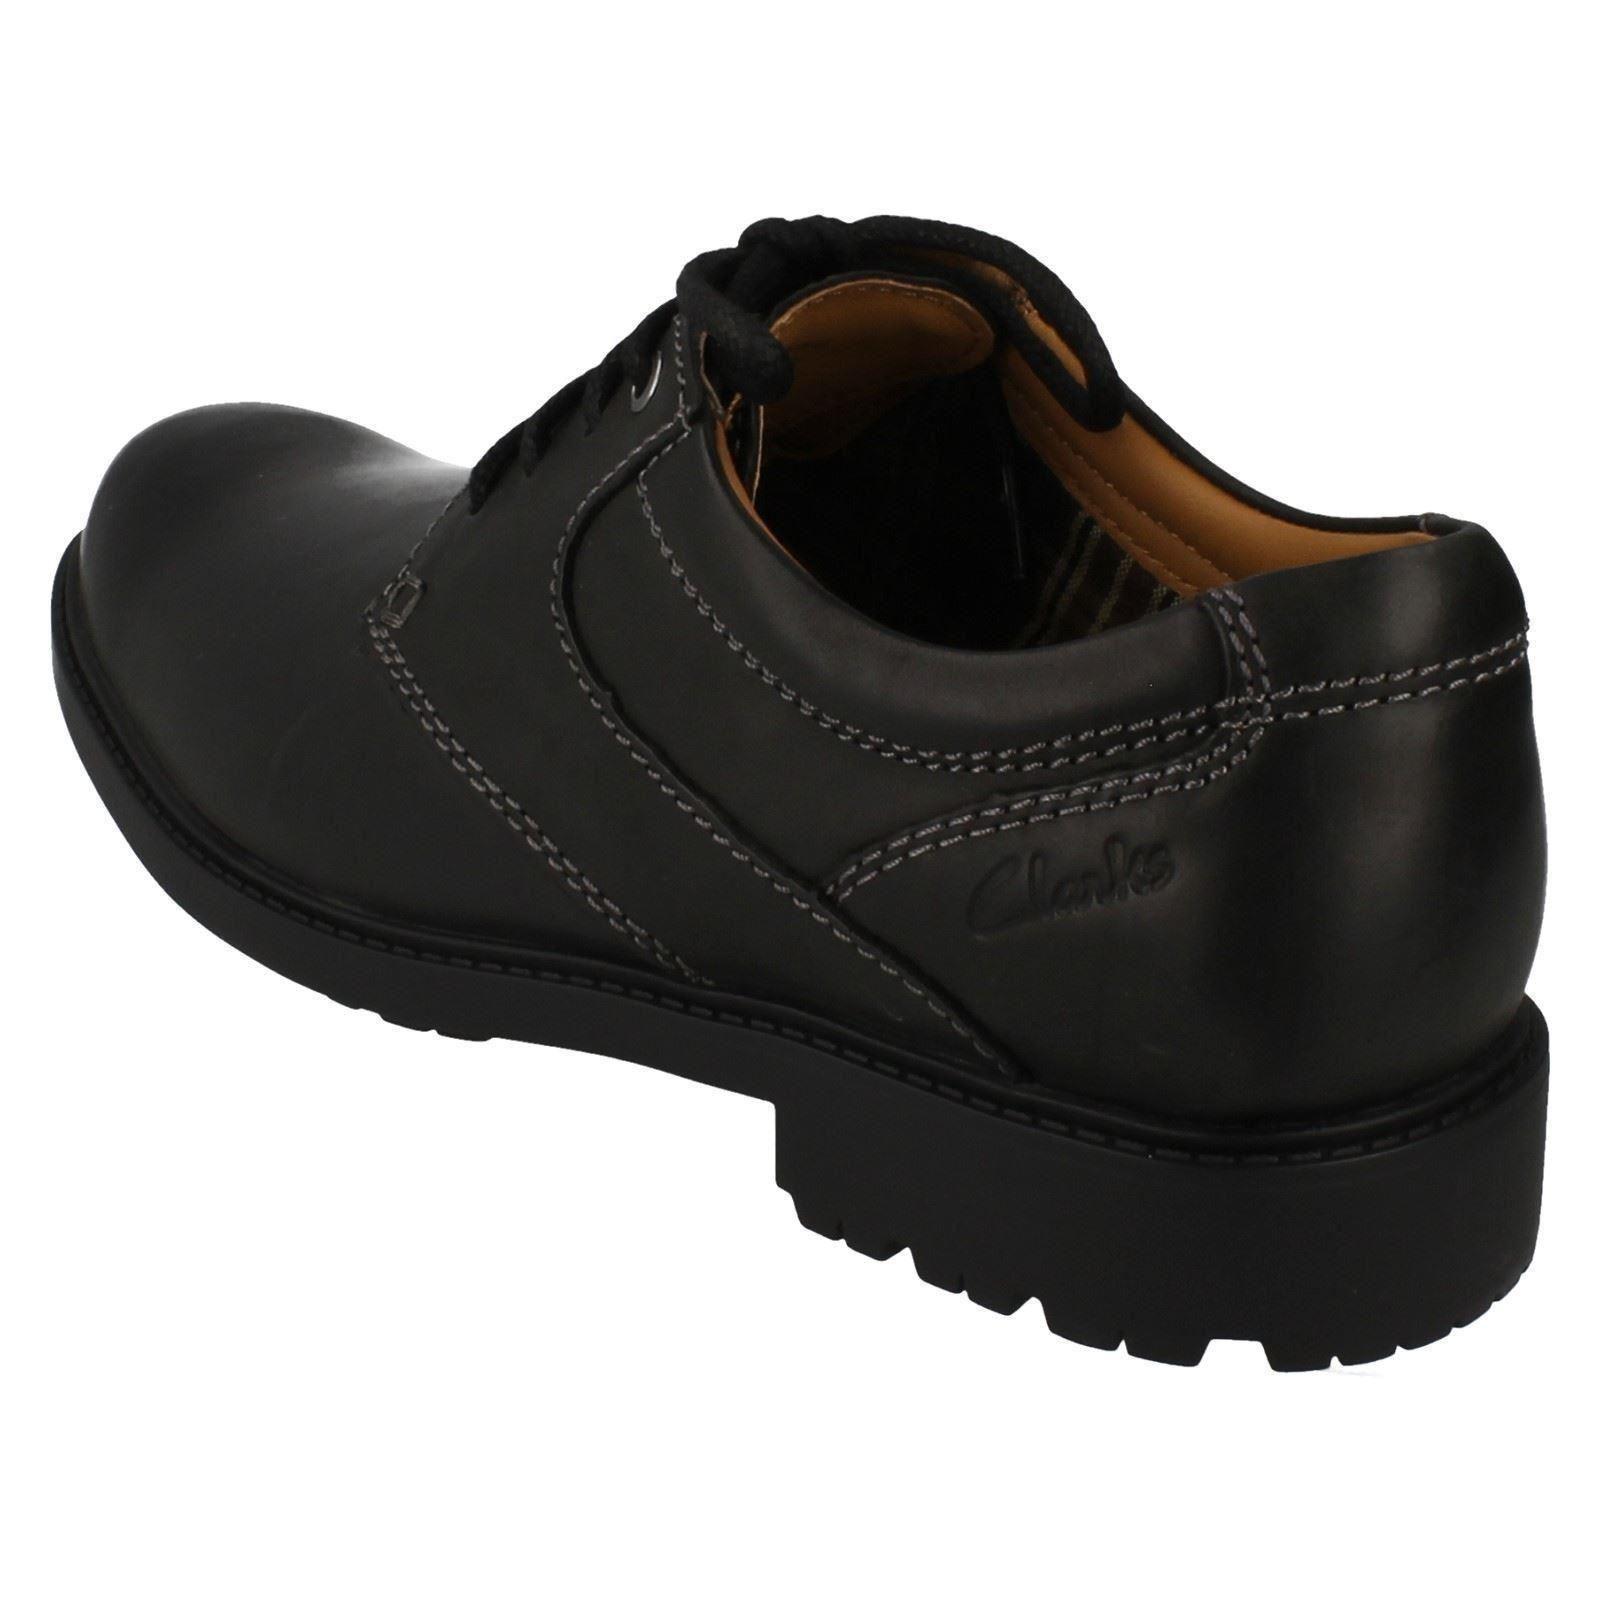 Men's Clarks Shoes Shoes Clarks - Redworth Day 14c8fb